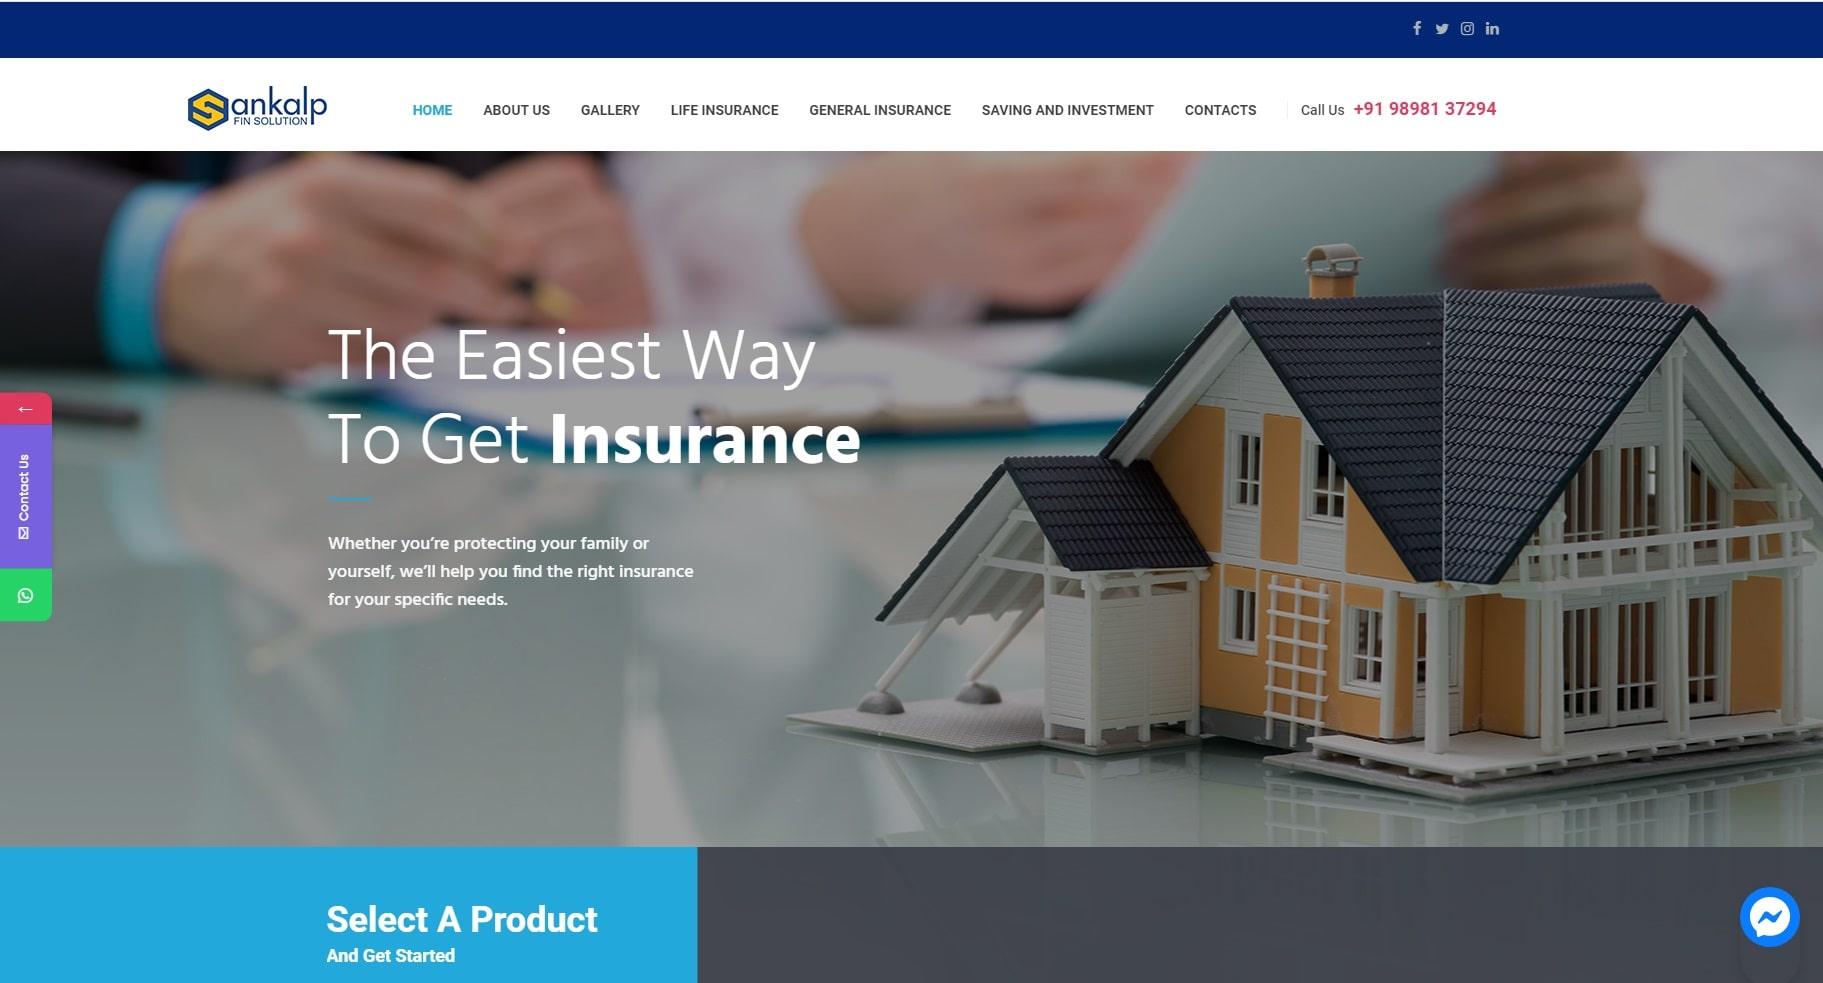 Sankalp Fin Solution - Starland IT Solution